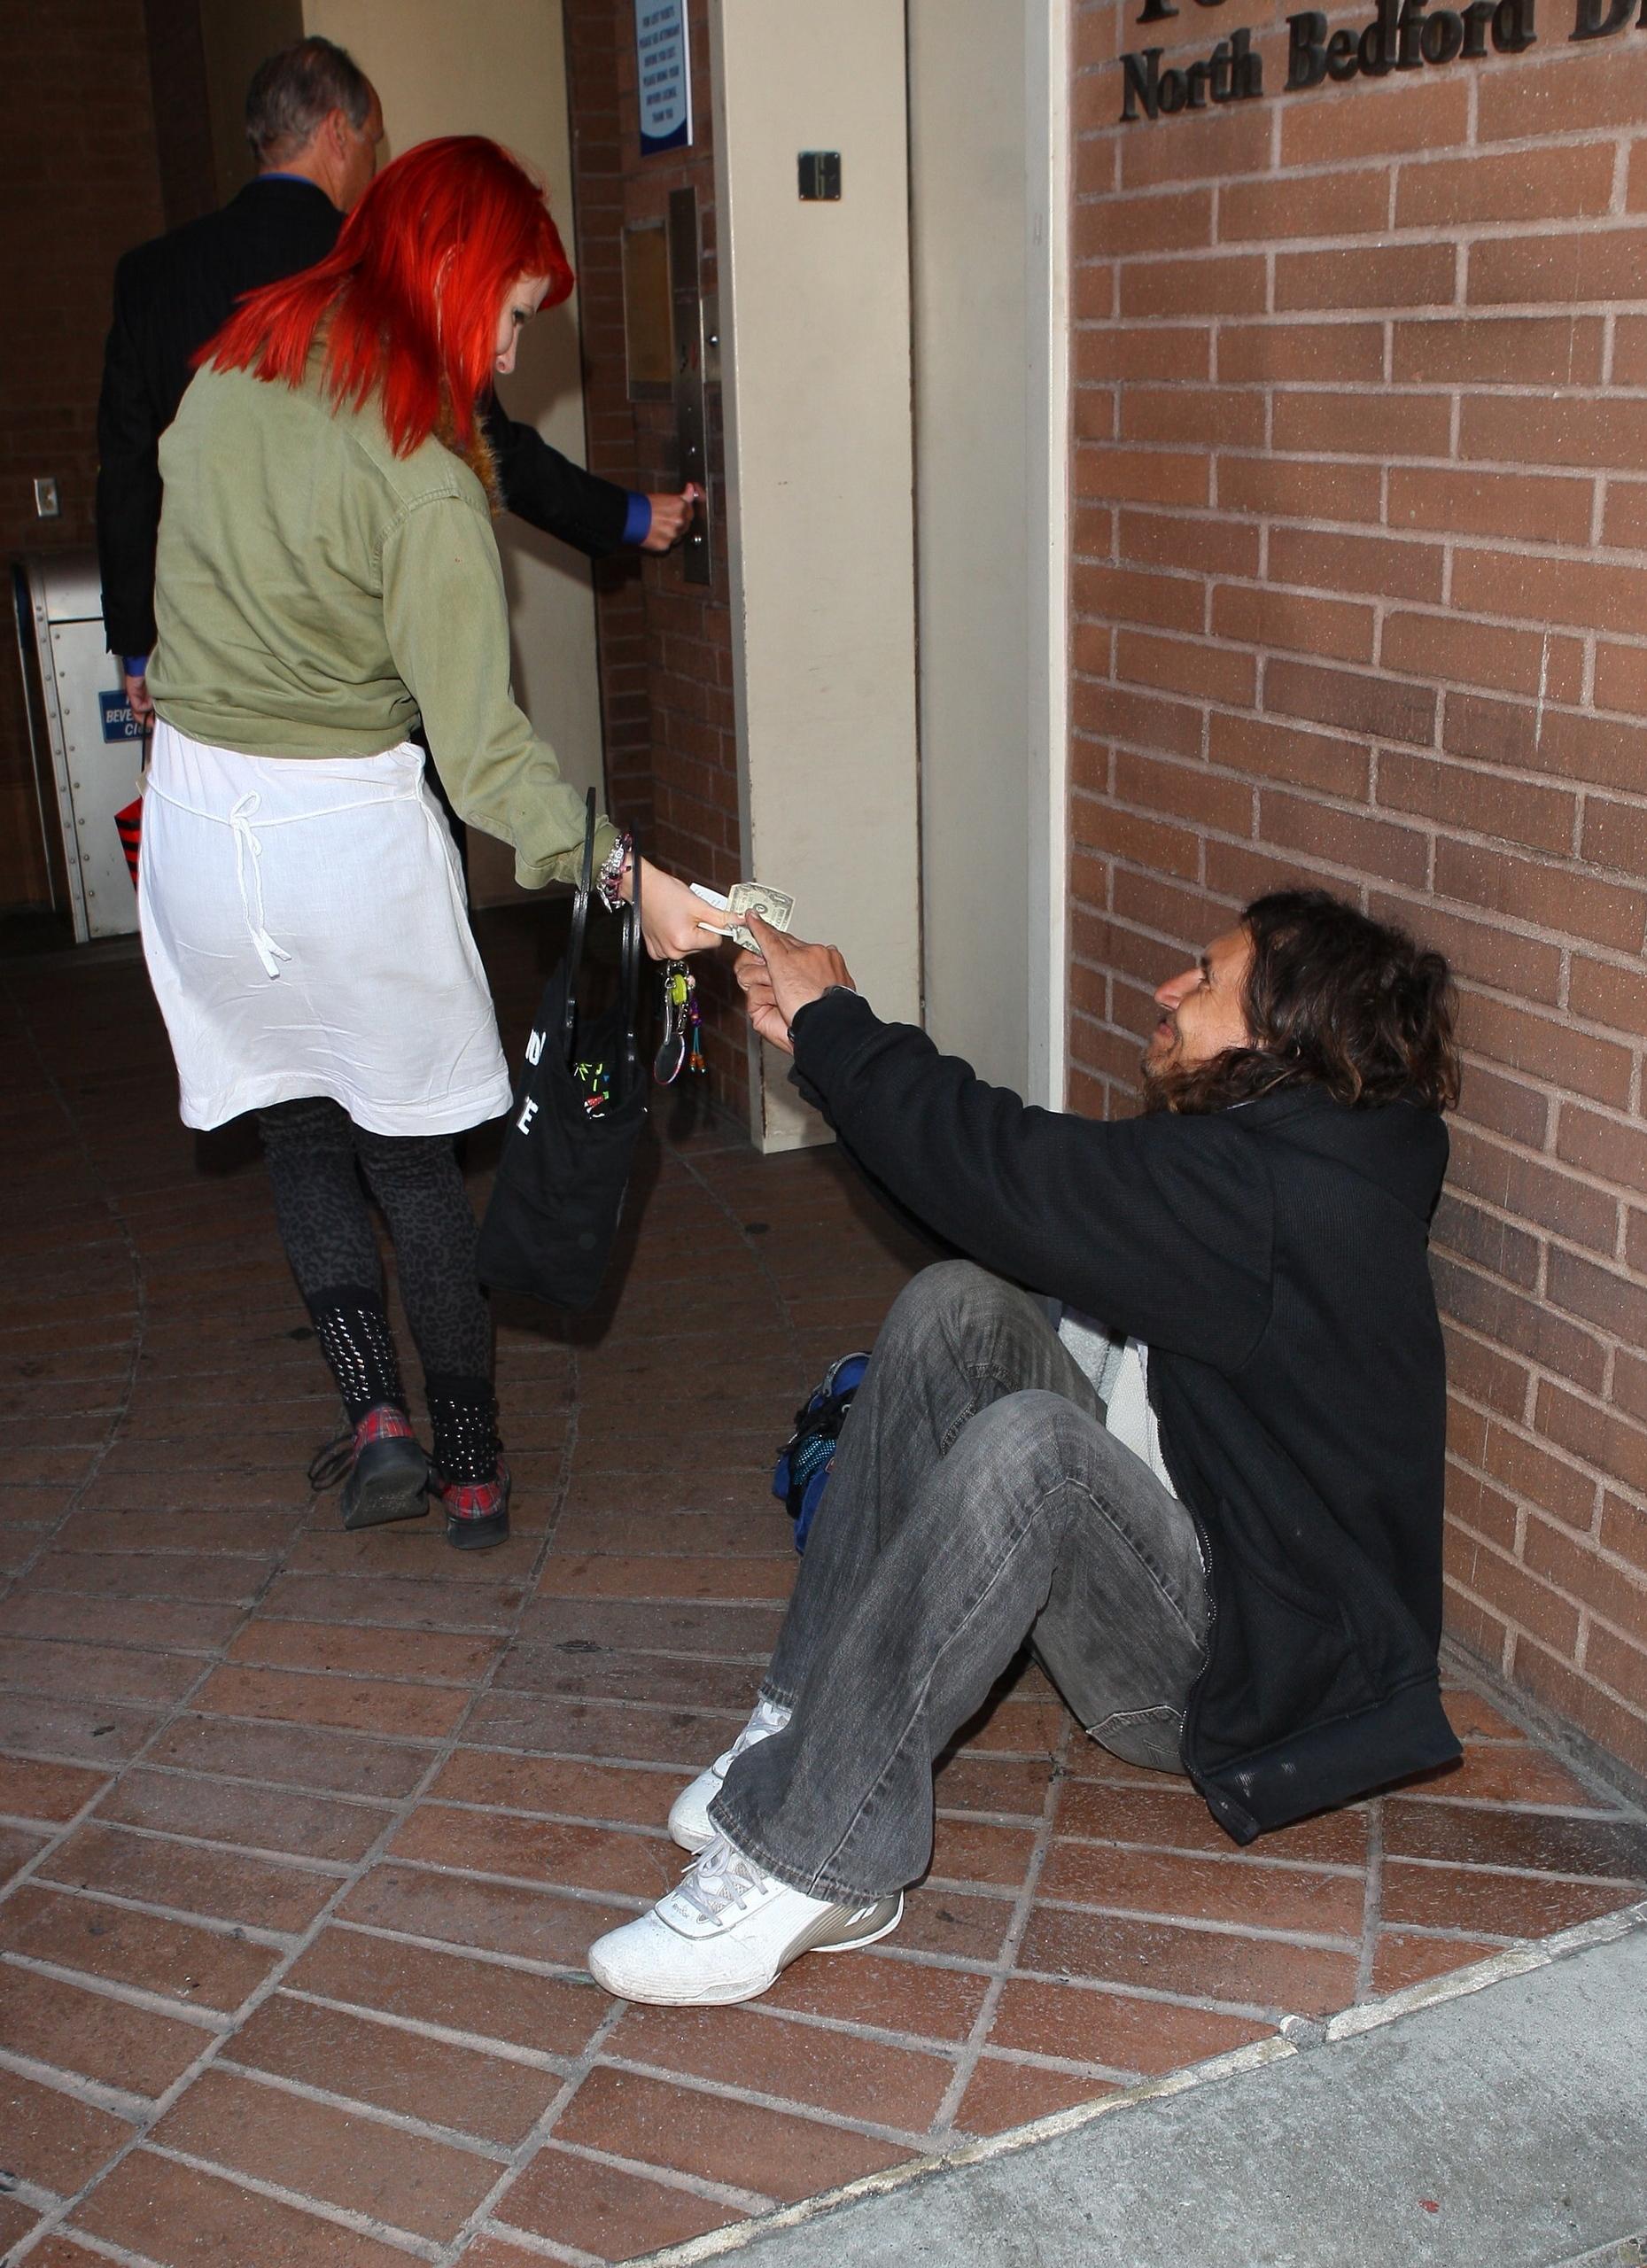 Beverly Hills (28.3.2011)